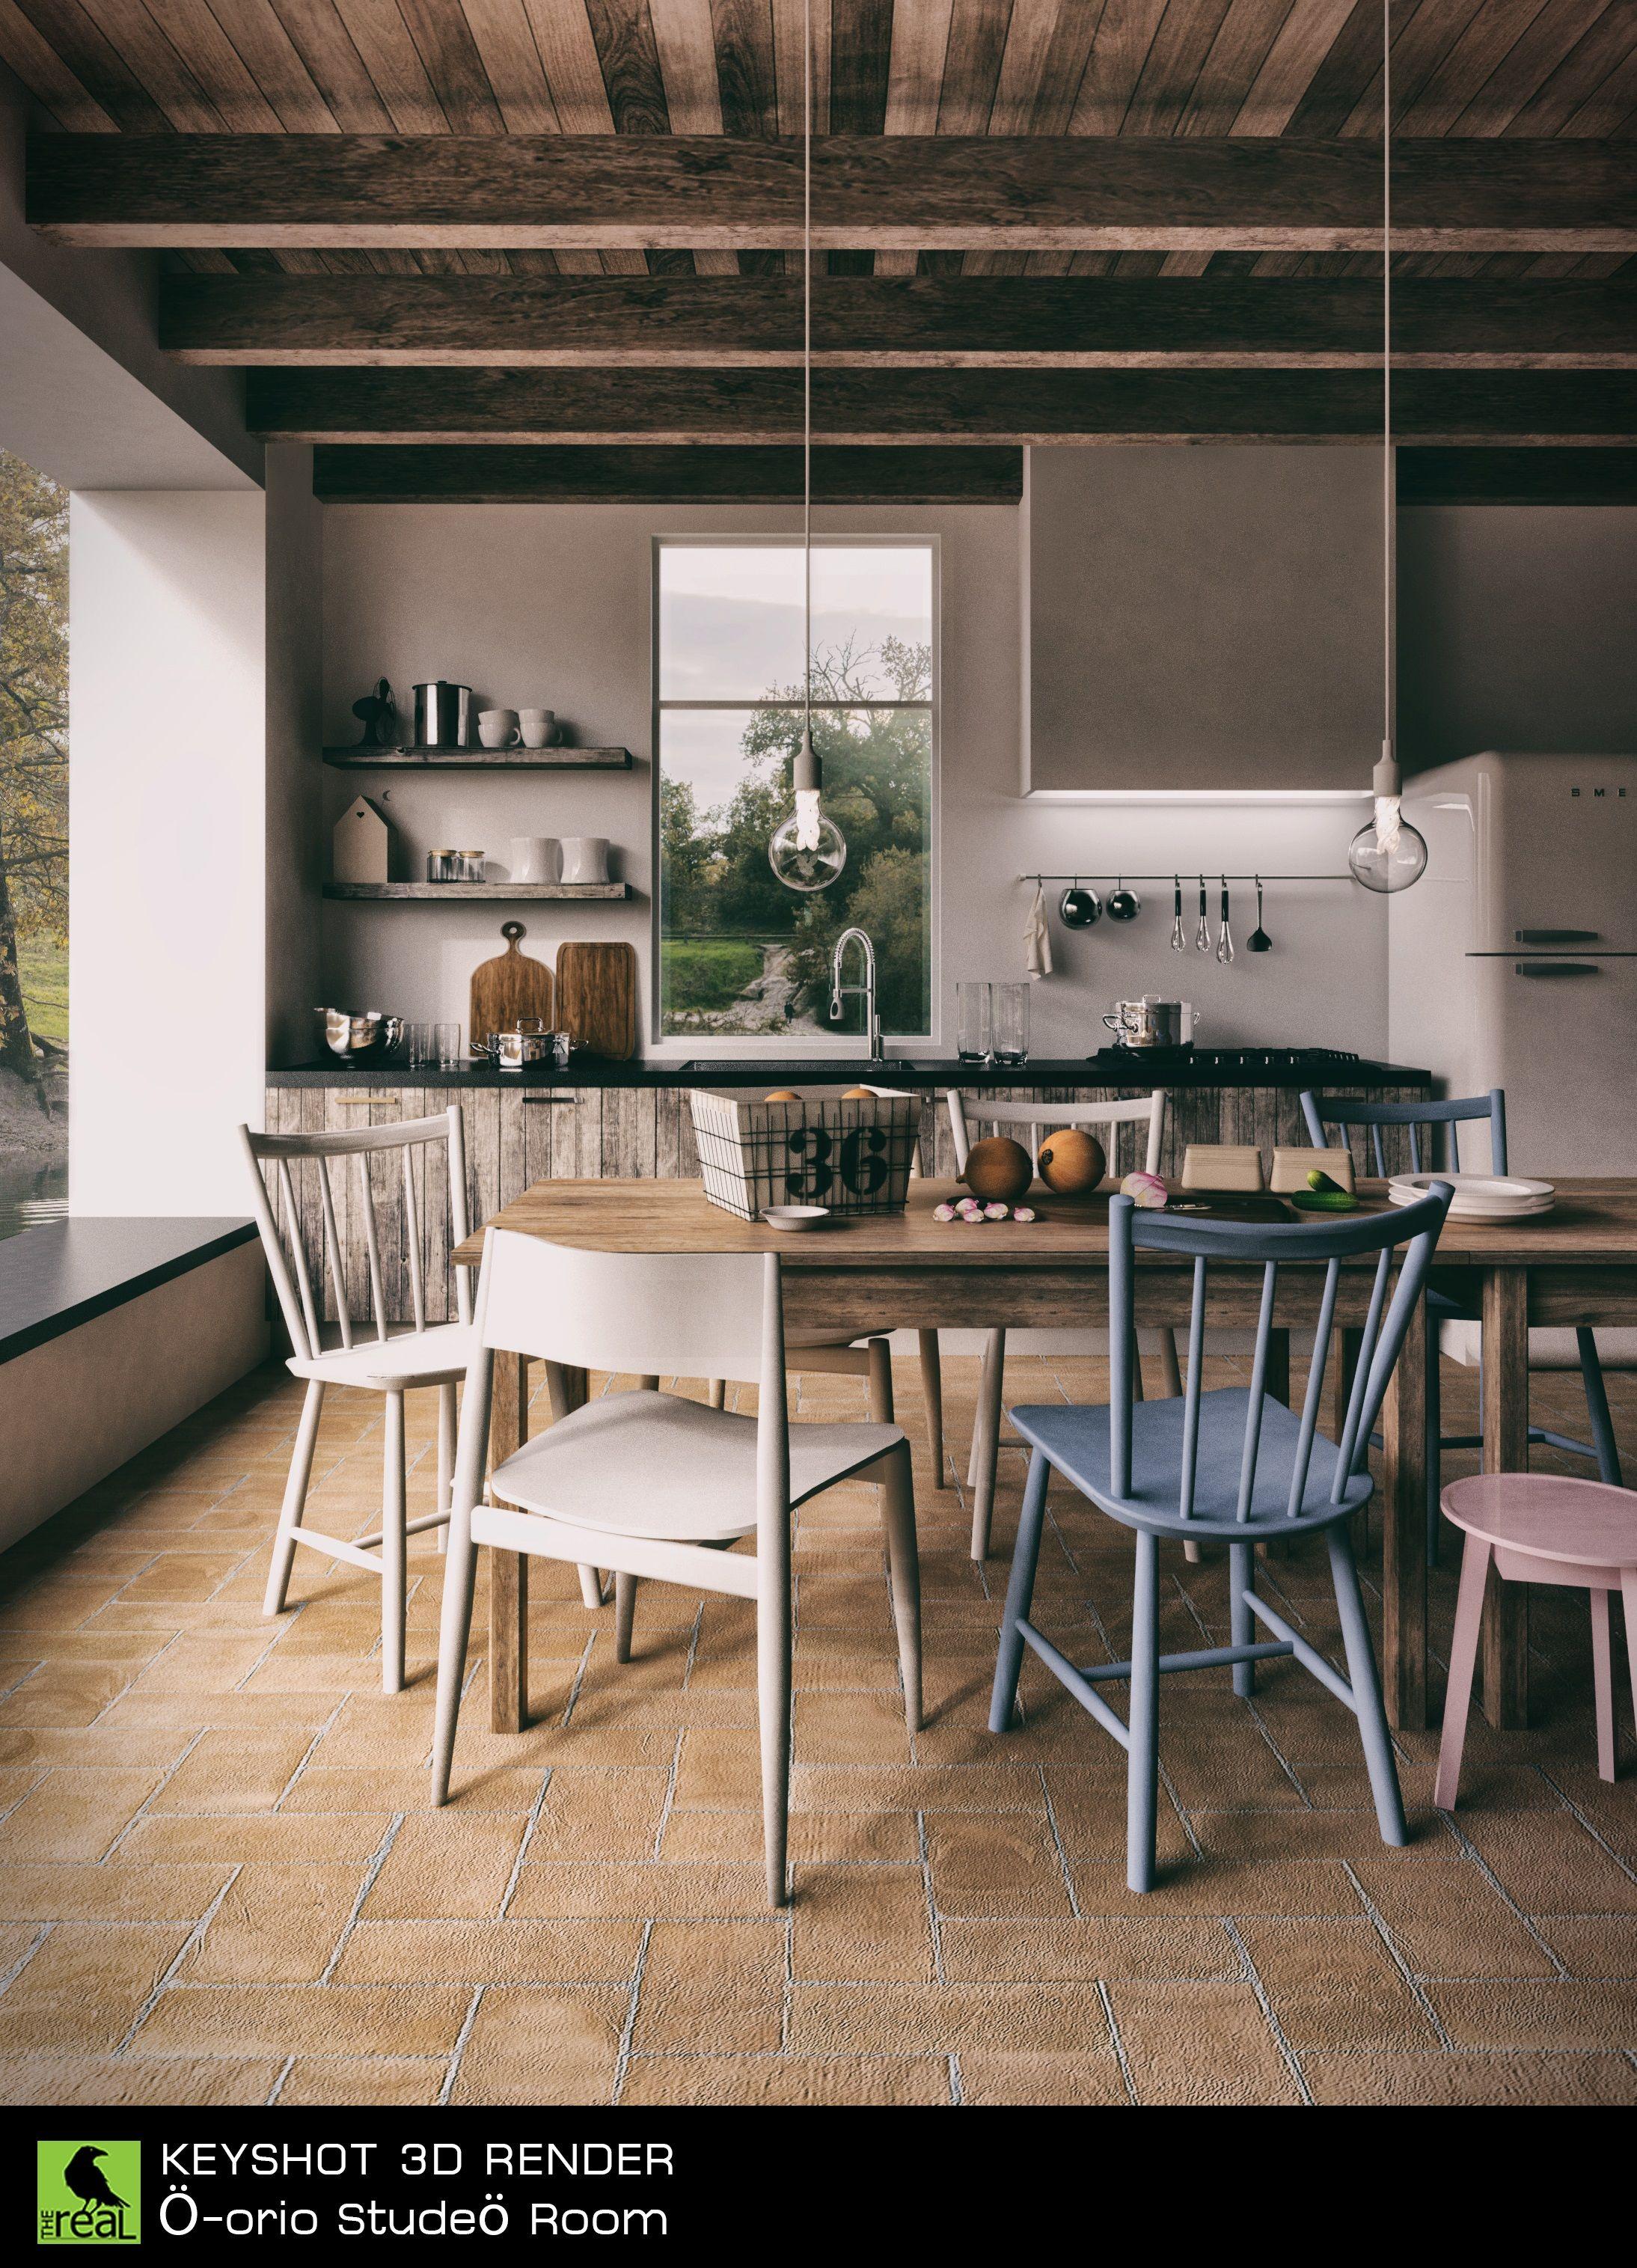 Interior Architecture And Design Jobs By Kitchen Rendered In Keyshot 6 Boyd Meeji